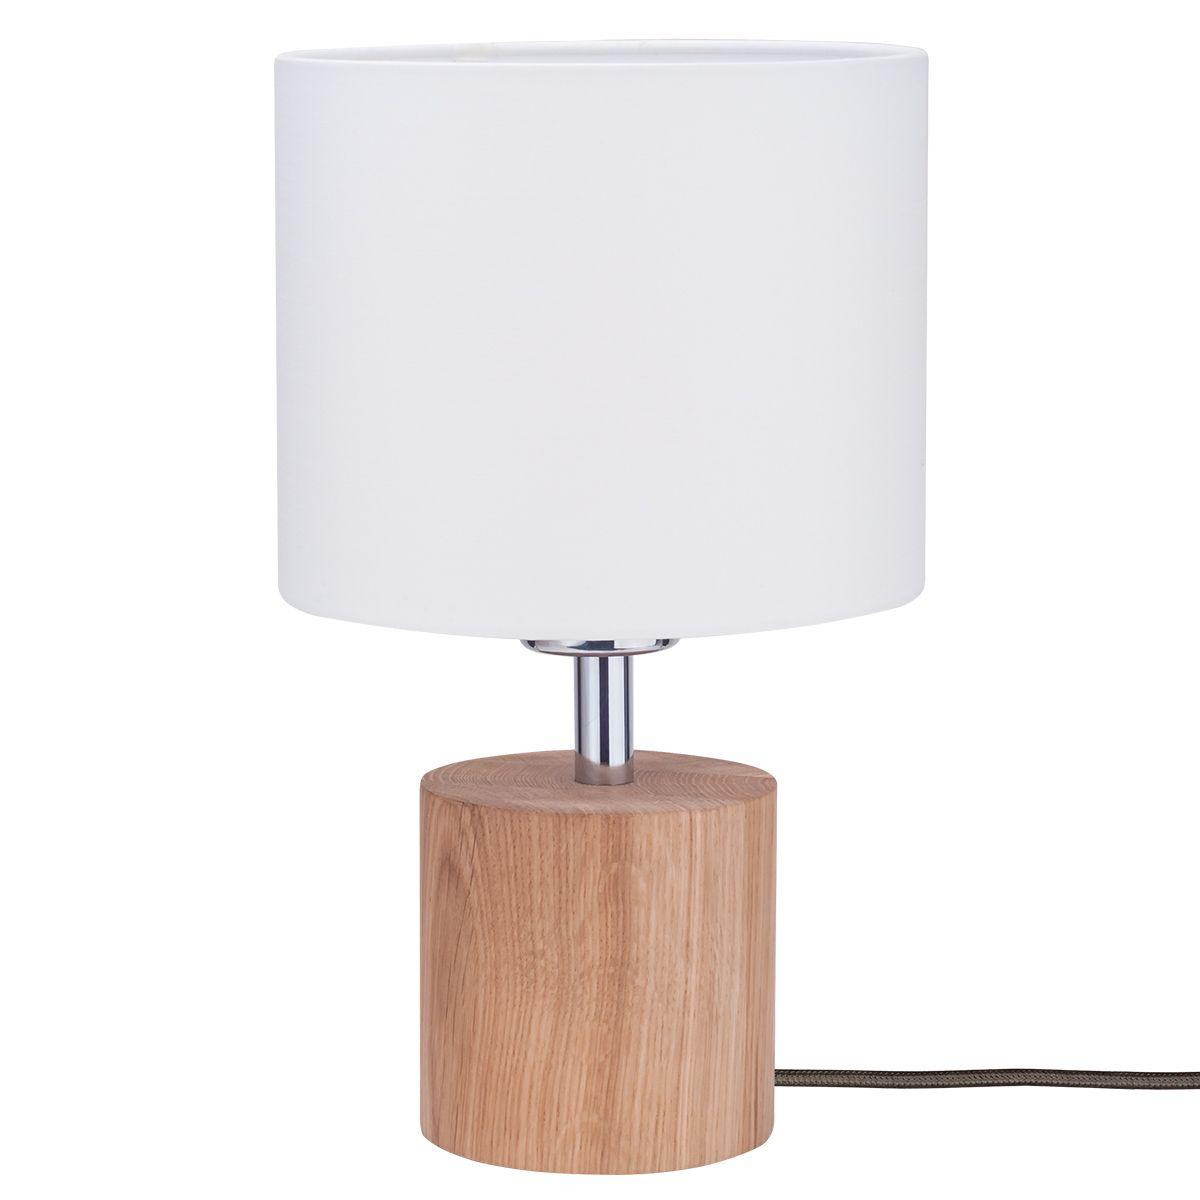 Hübsche Tischlampe Trongo eiche geölt Schirm weiß Jetzt bestellen unter: https://moebel.ladendirekt.de/lampen/tischleuchten/beistelltischlampen/?uid=c693e794-434e-51d4-97d6-b6bdc6a1c19f&utm_source=pinterest&utm_medium=pin&utm_campaign=boards #lampen #tischleuchten #beistelltischlampen Bild Quelle: www.lampenwelt.de